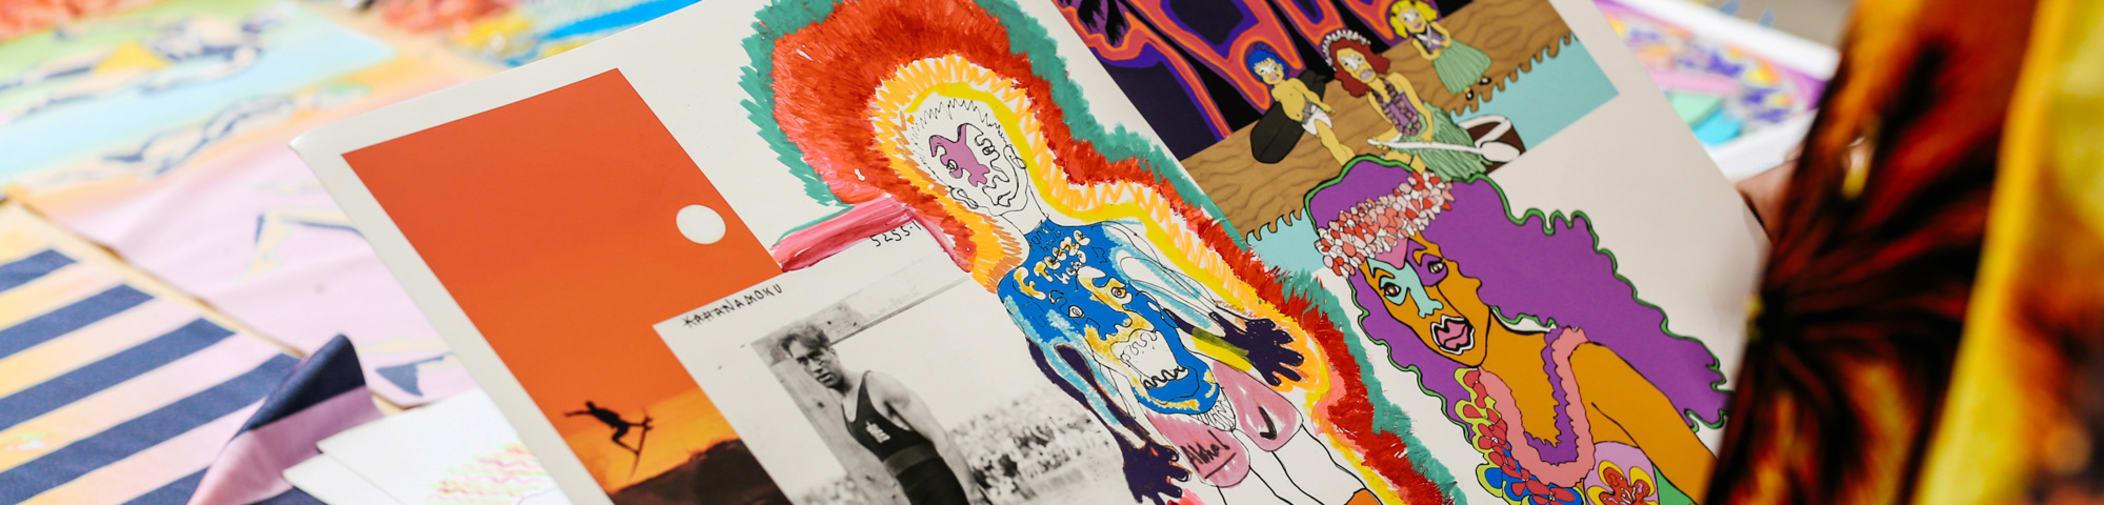 Collage by Edward Mendoza, BA Fashion: Fashion Print, Central Saint Martins